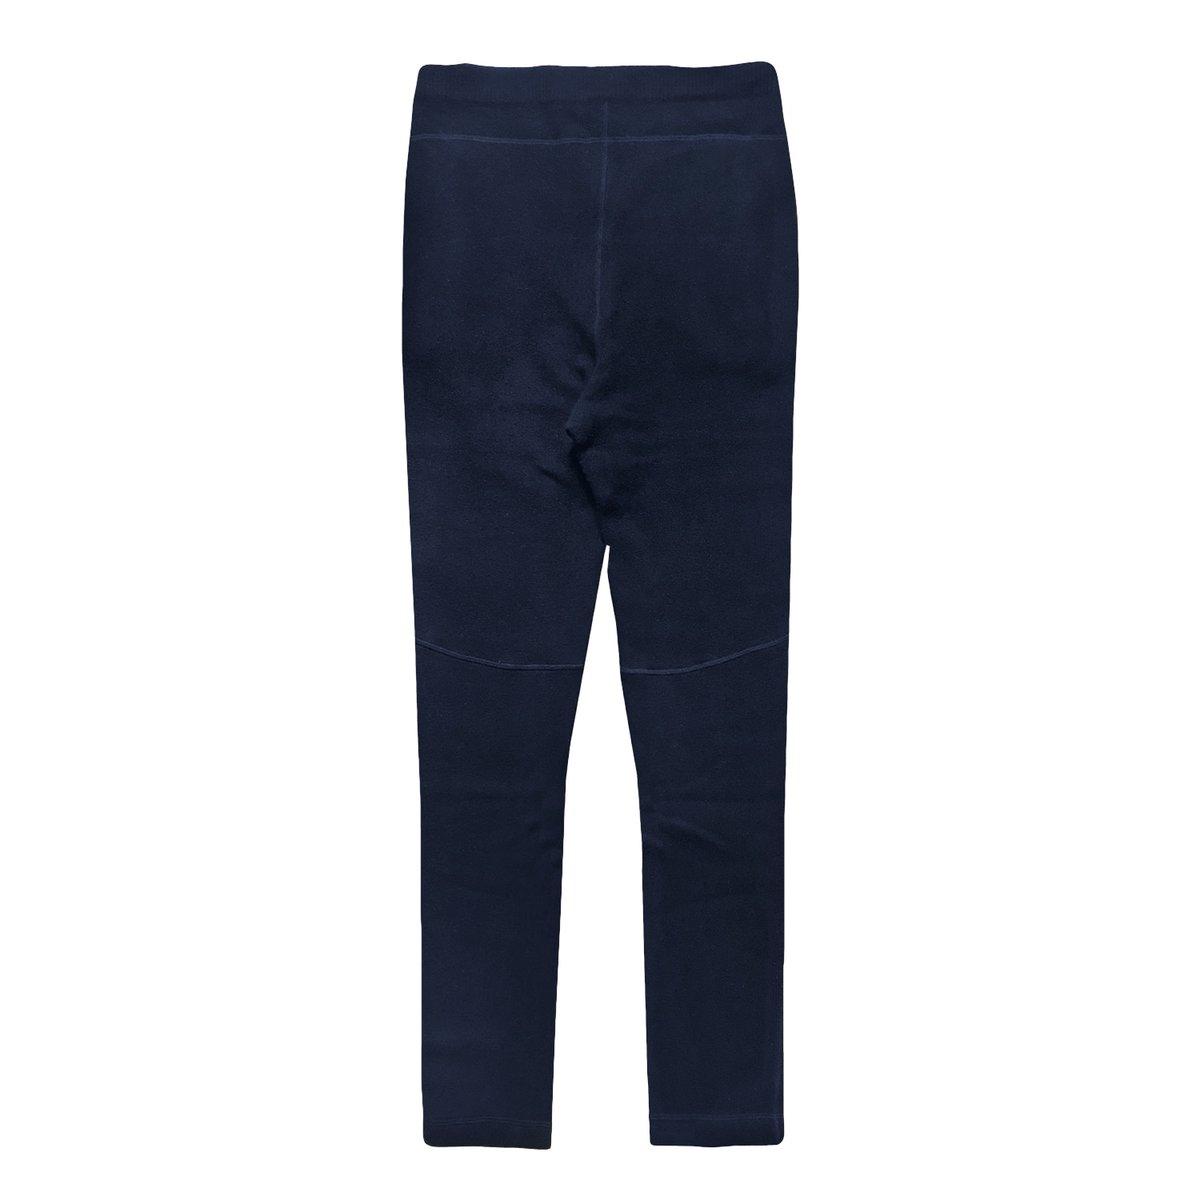 gray wool knit pants b.jpg